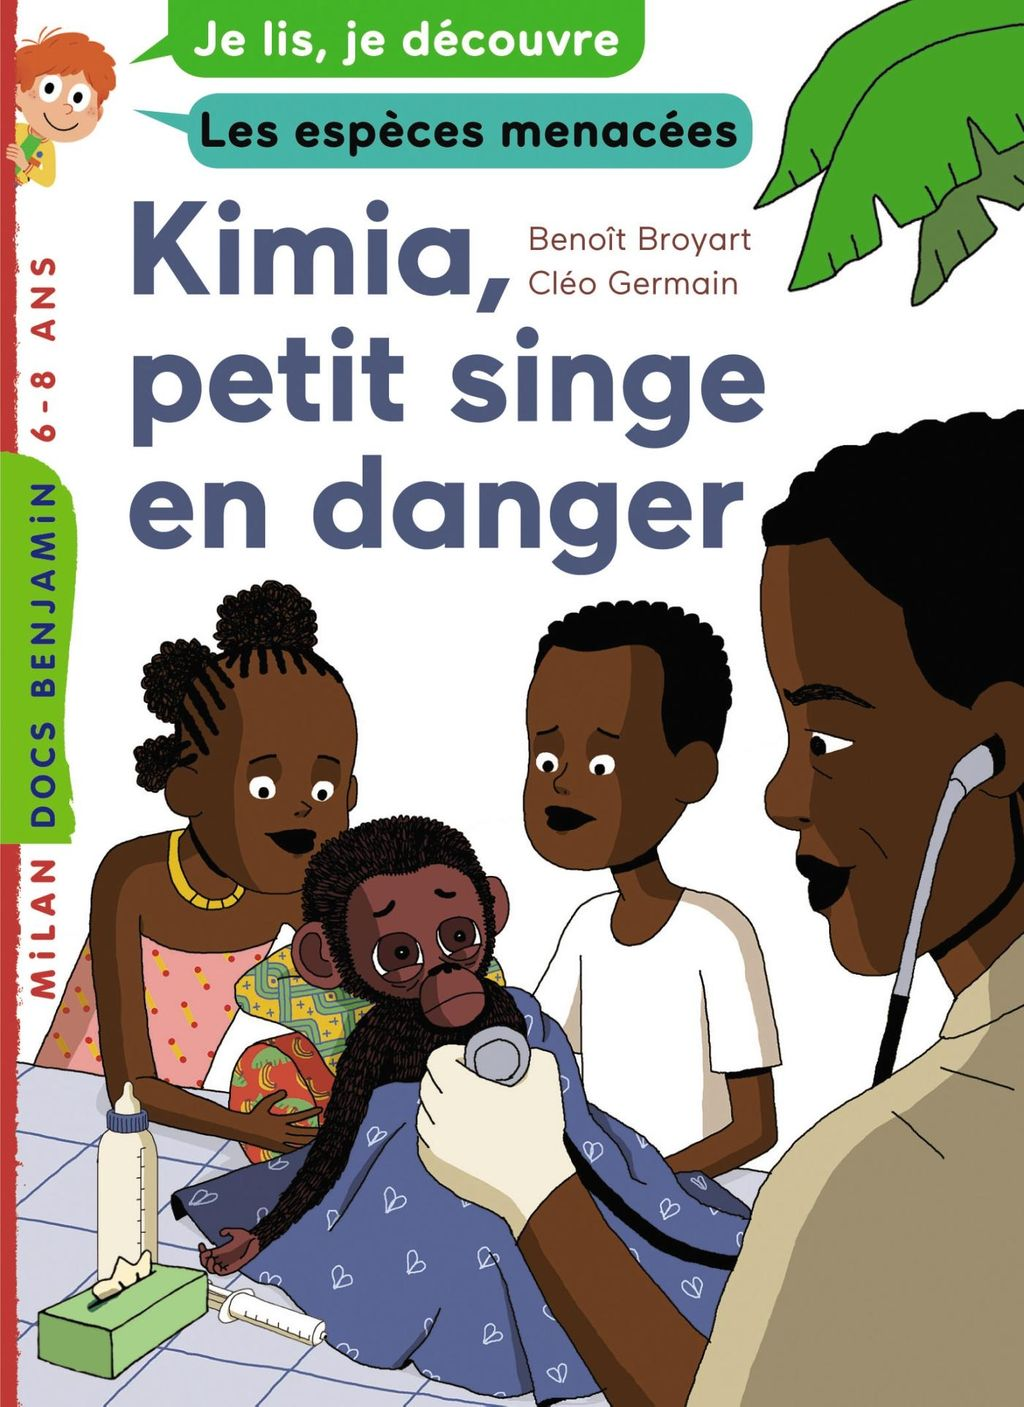 «Kimia, petit singe en danger» cover